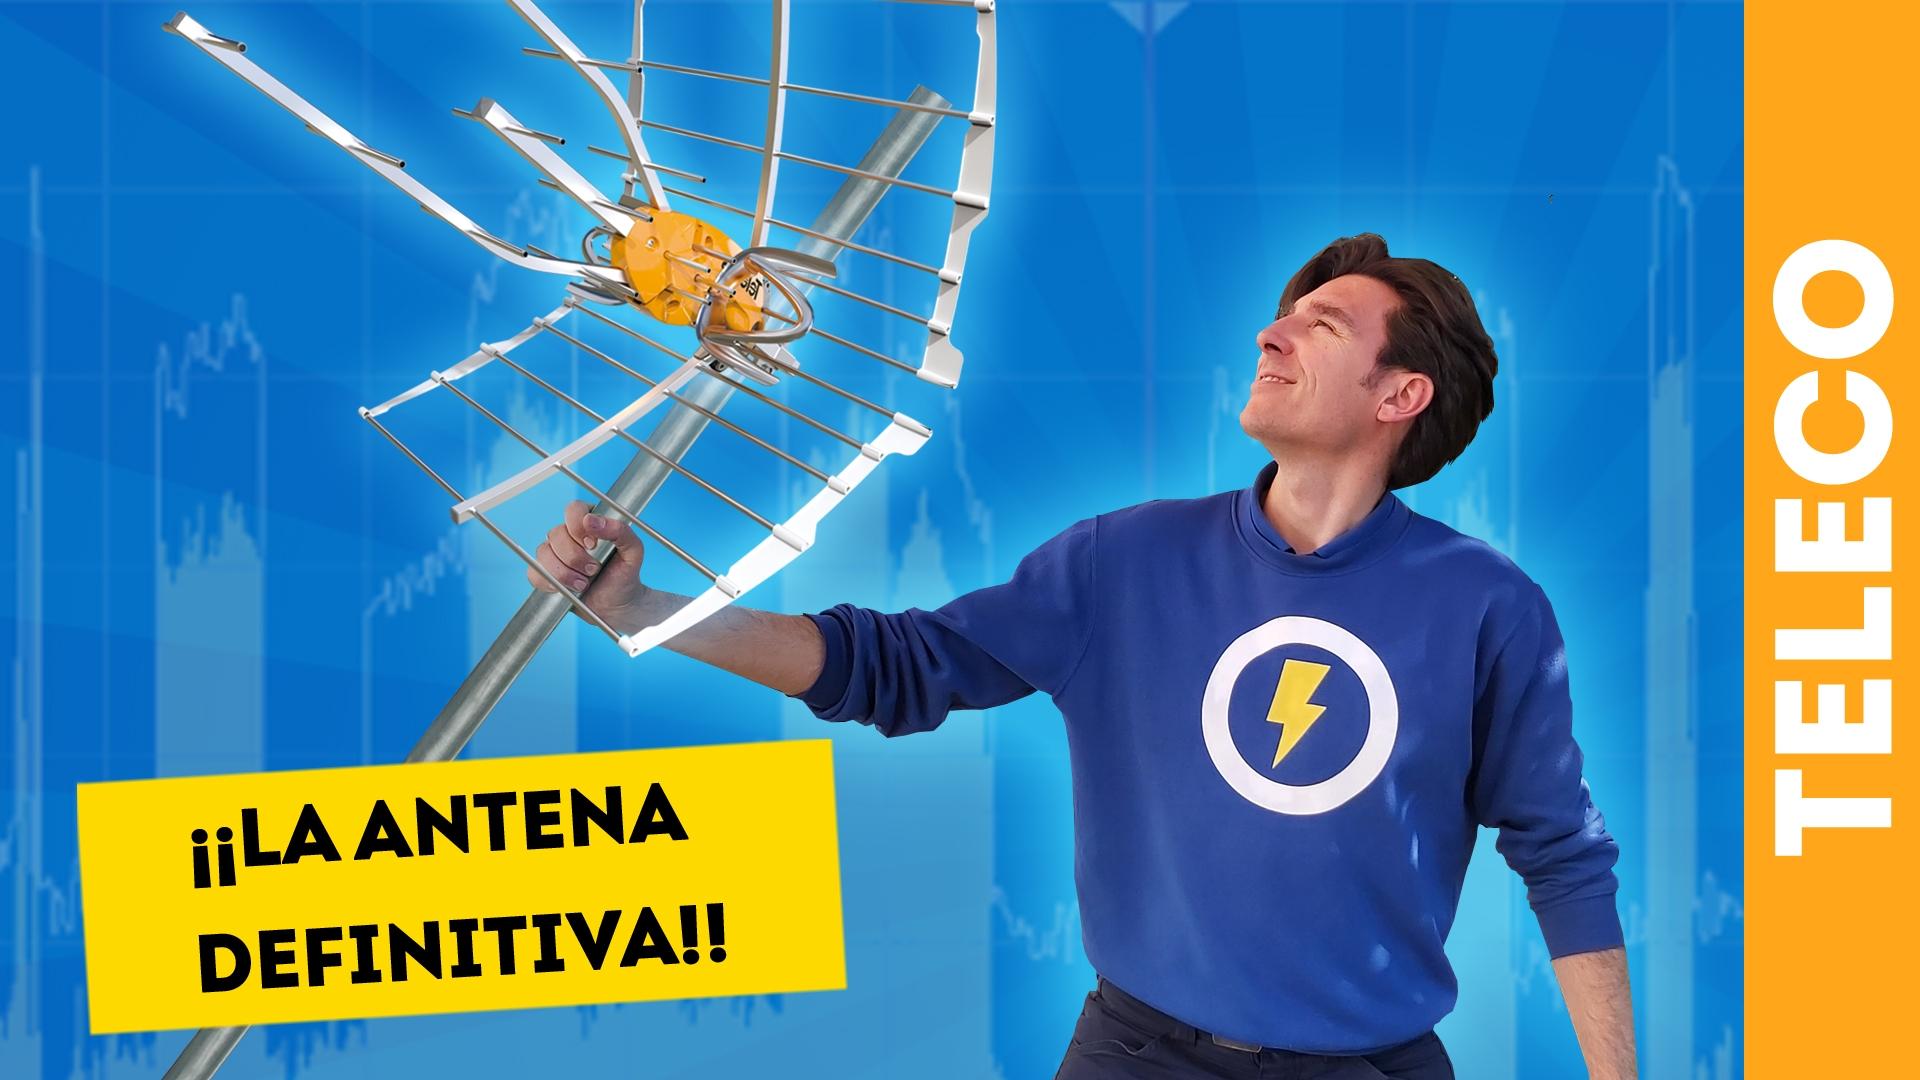 la-antena-tdt-definitiva-ellipse-televes